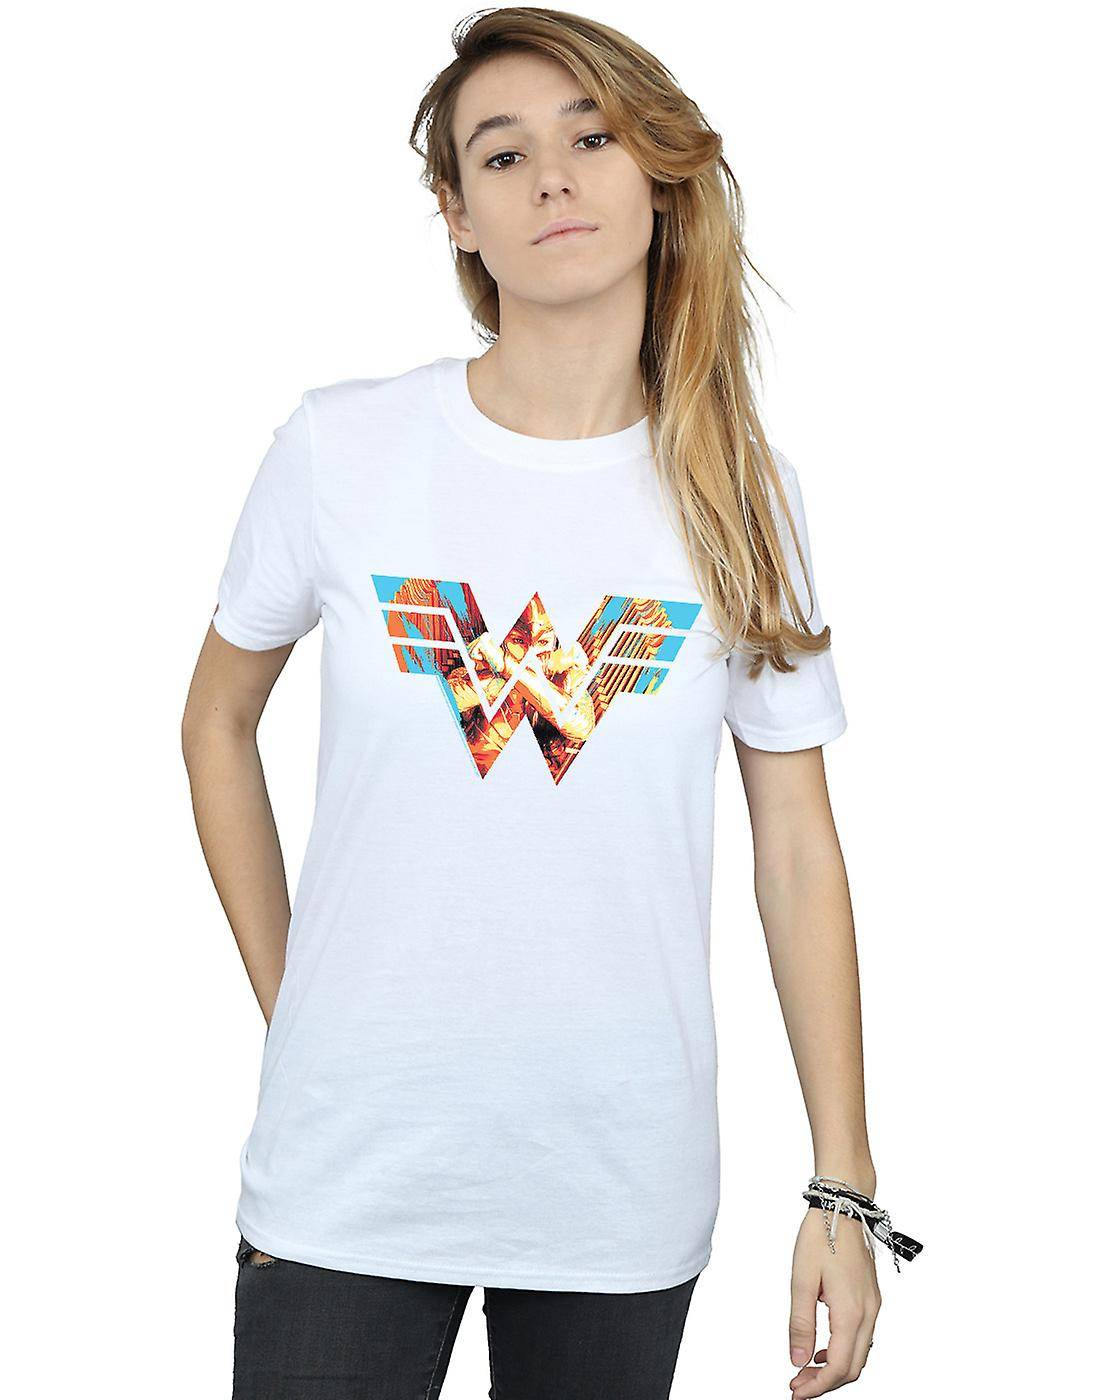 Absolute Cult DC Comics Femmes-apos;s Wonder Woman 84 Symbol Crossed Arms Boyfriend Fit T-Shirt Noir Small